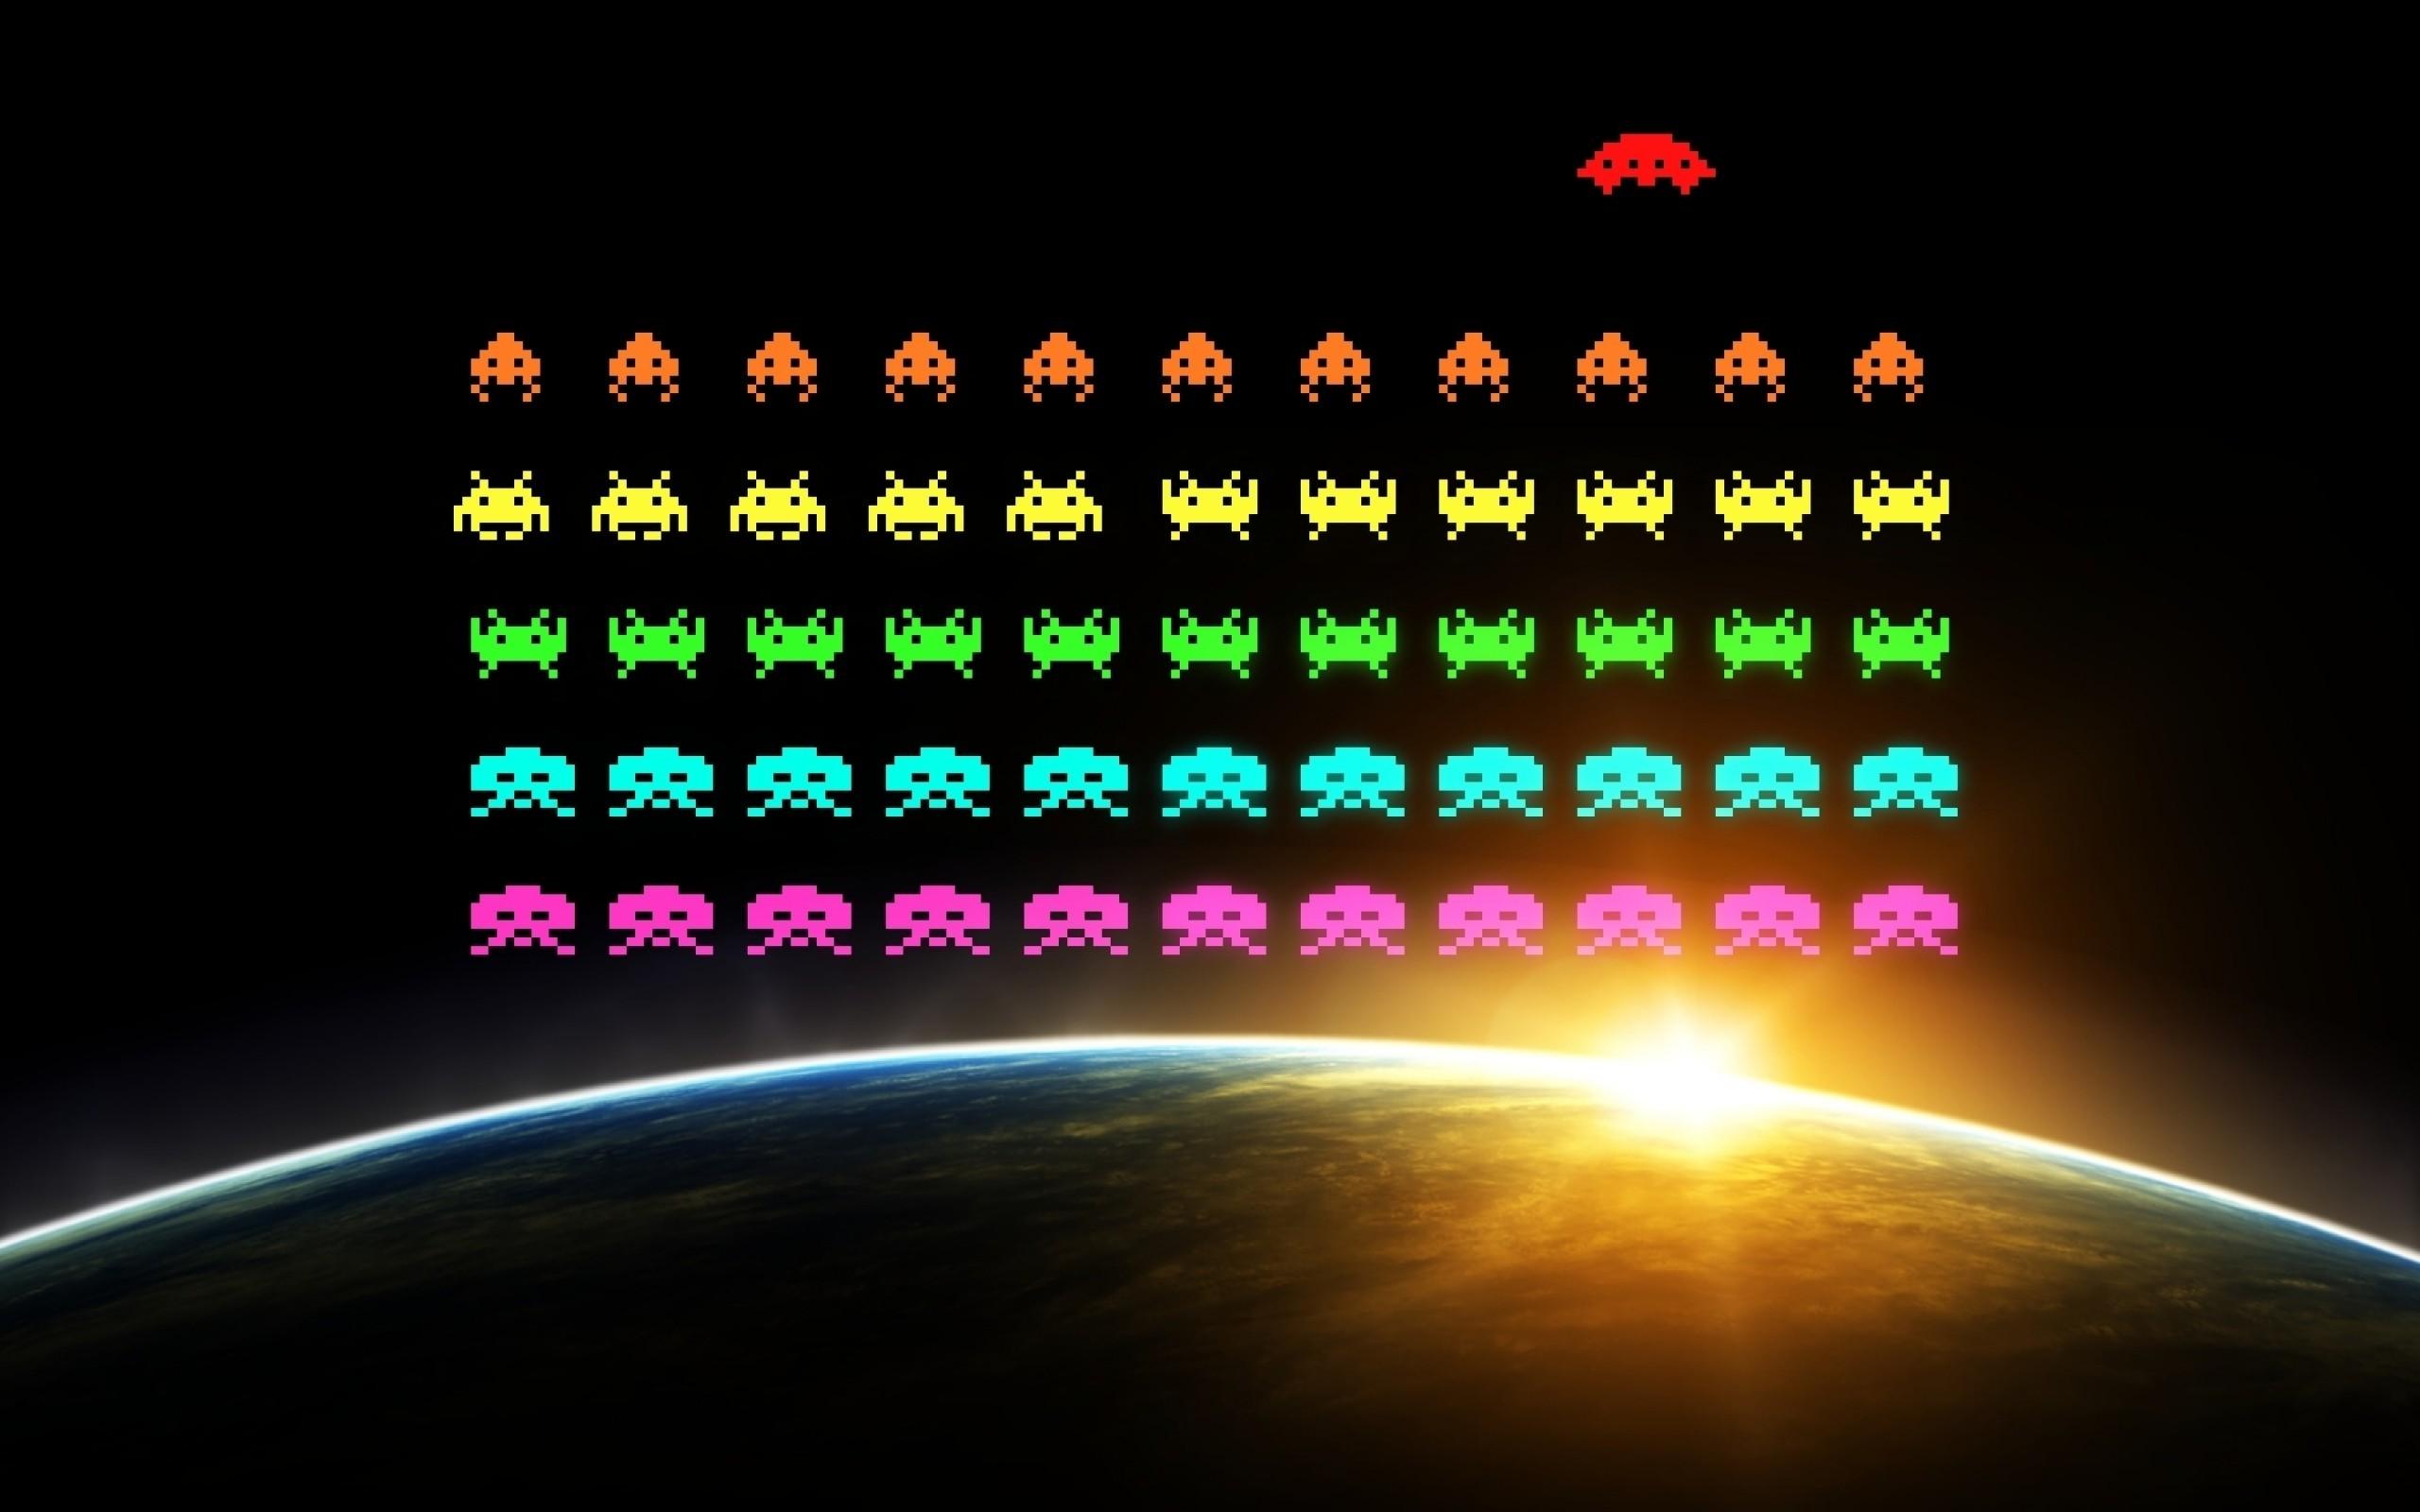 Best Wallpaper Movie Pixels - colorful-digital-art-video-games-black-background-night-pixel-art-space-Earth-Space-Invaders-Sun-pixels-circle-aliens-vintage-light-line-screenshot-2560x1600-px-computer-wallpaper-font-693798  You Should Have_29330.jpg